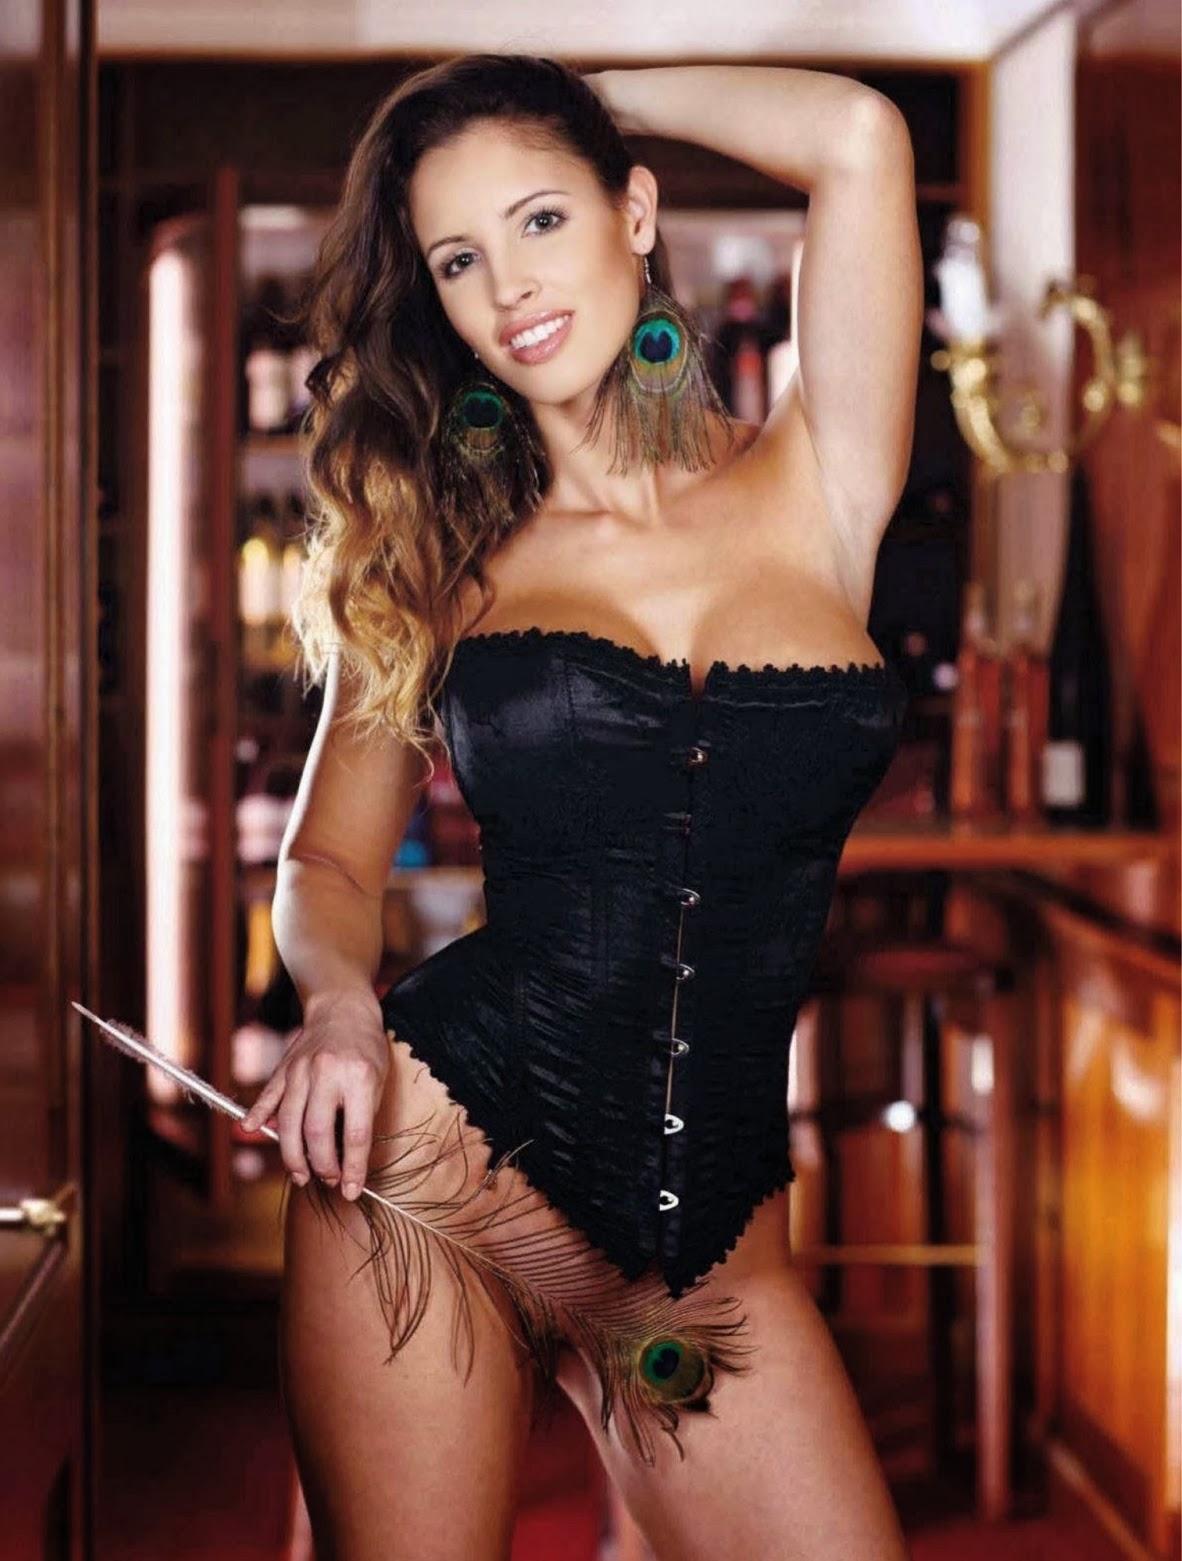 playboy shoot Lucia Javorcekova naked pussy strapless corset